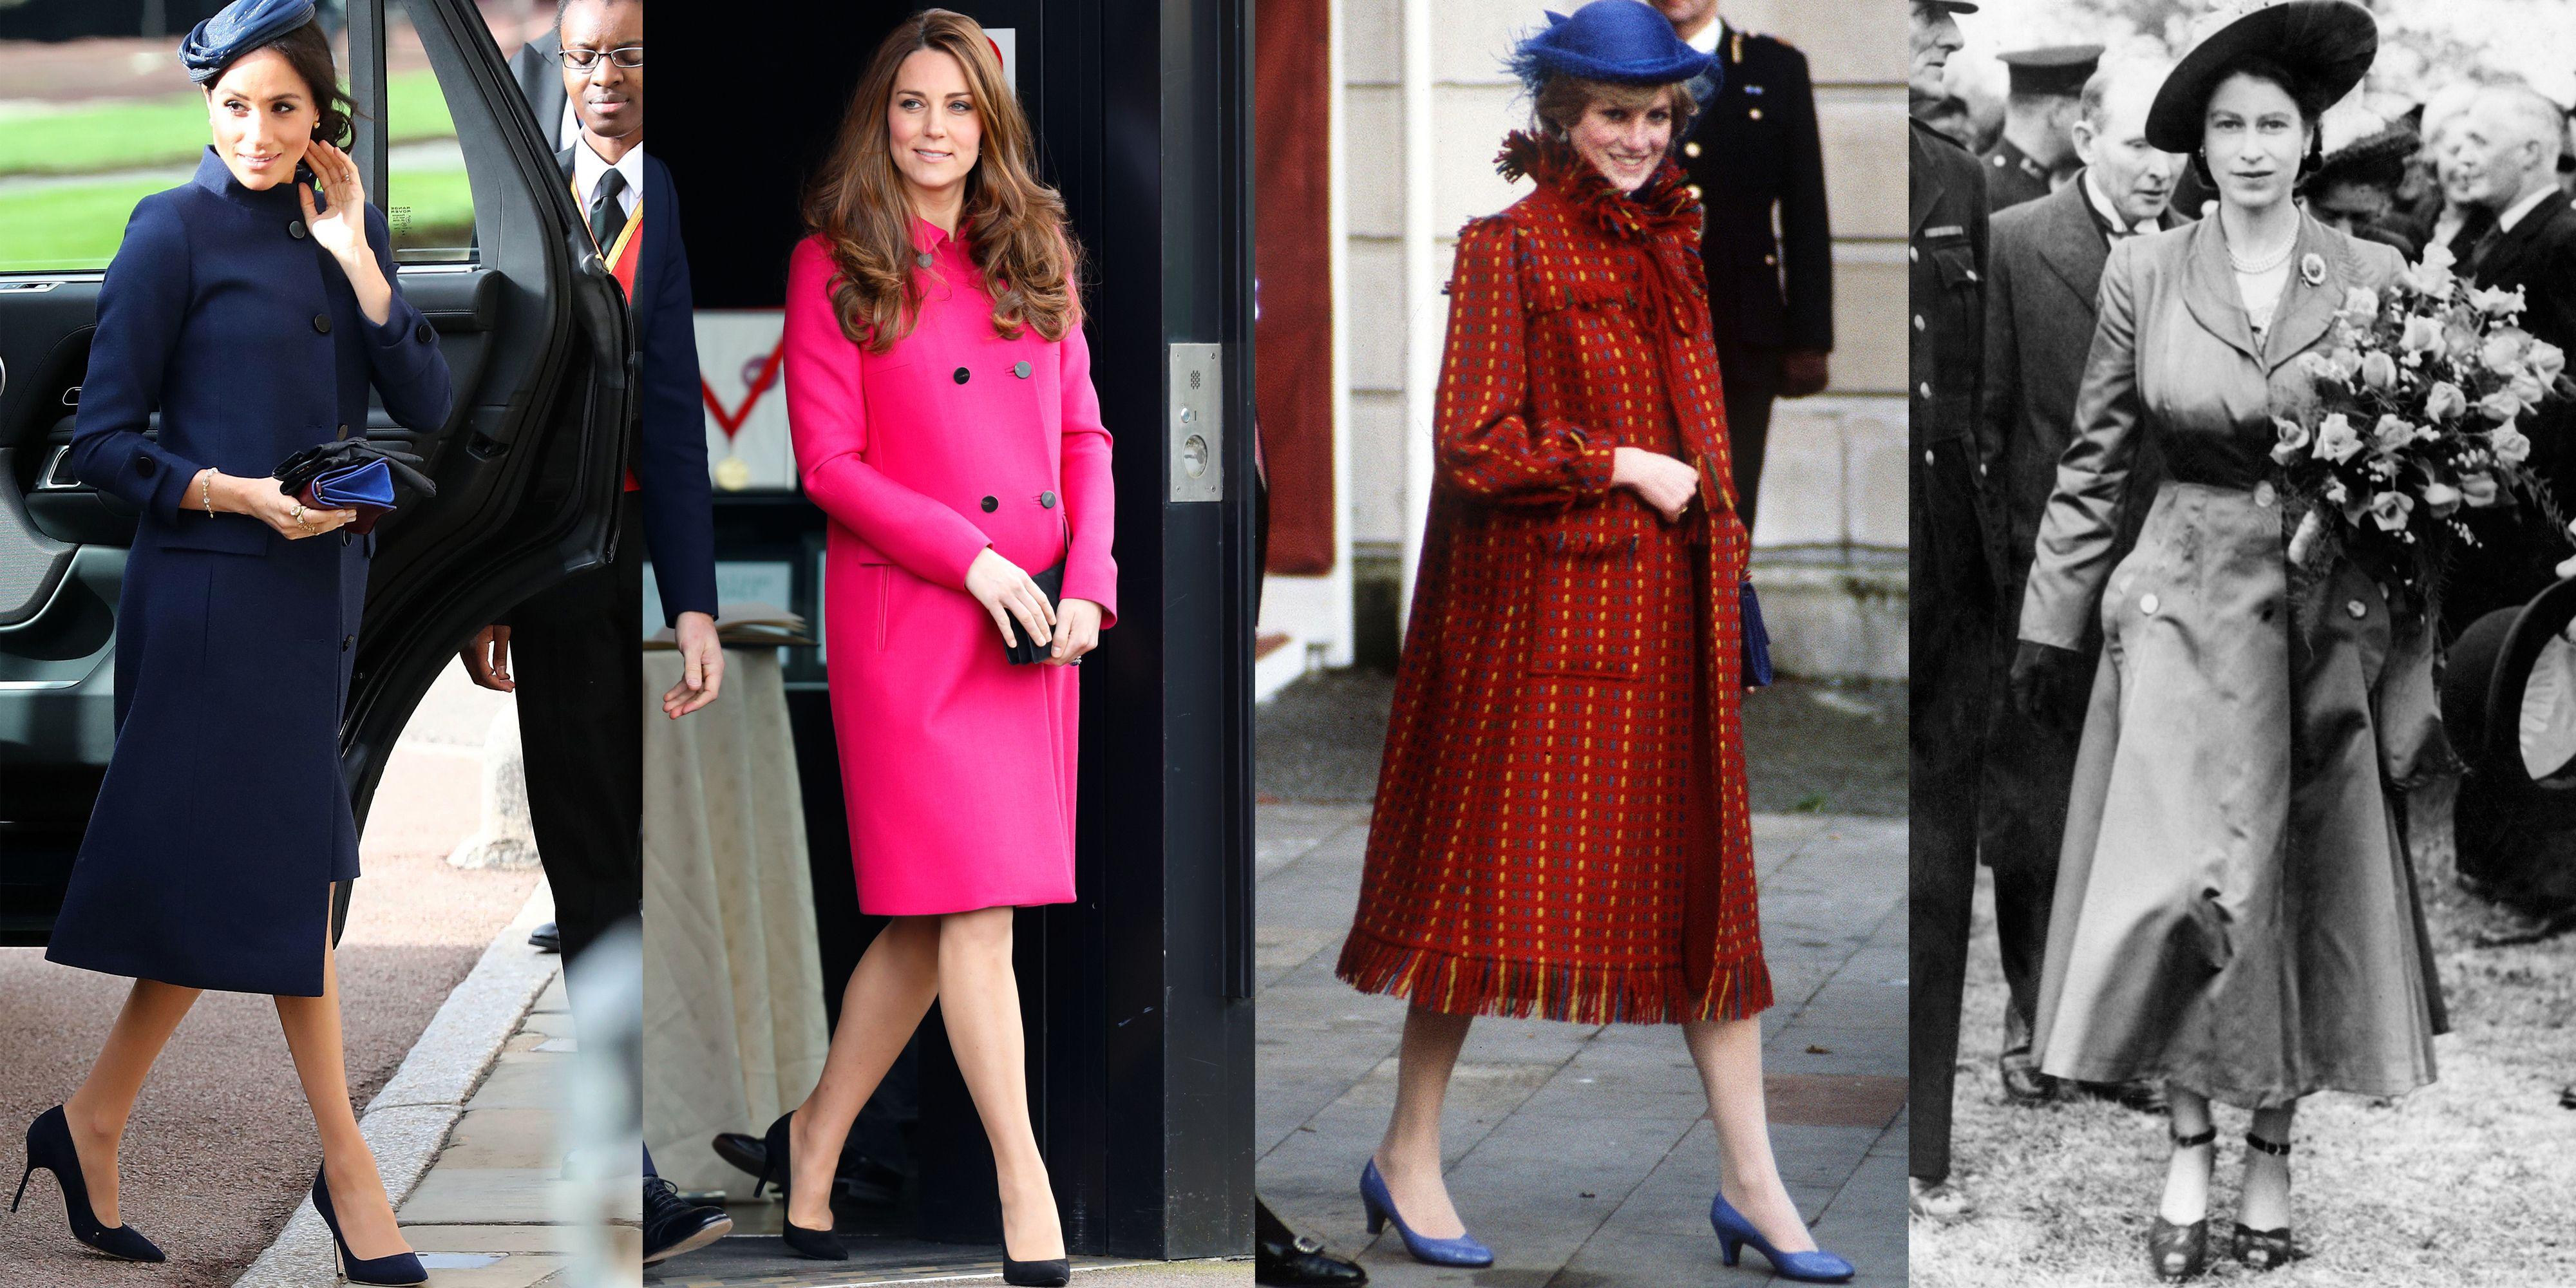 No, Prince Harry Meghan Markle Didnt Announce Their Pregnancy at Eugenie Jacks Wedding